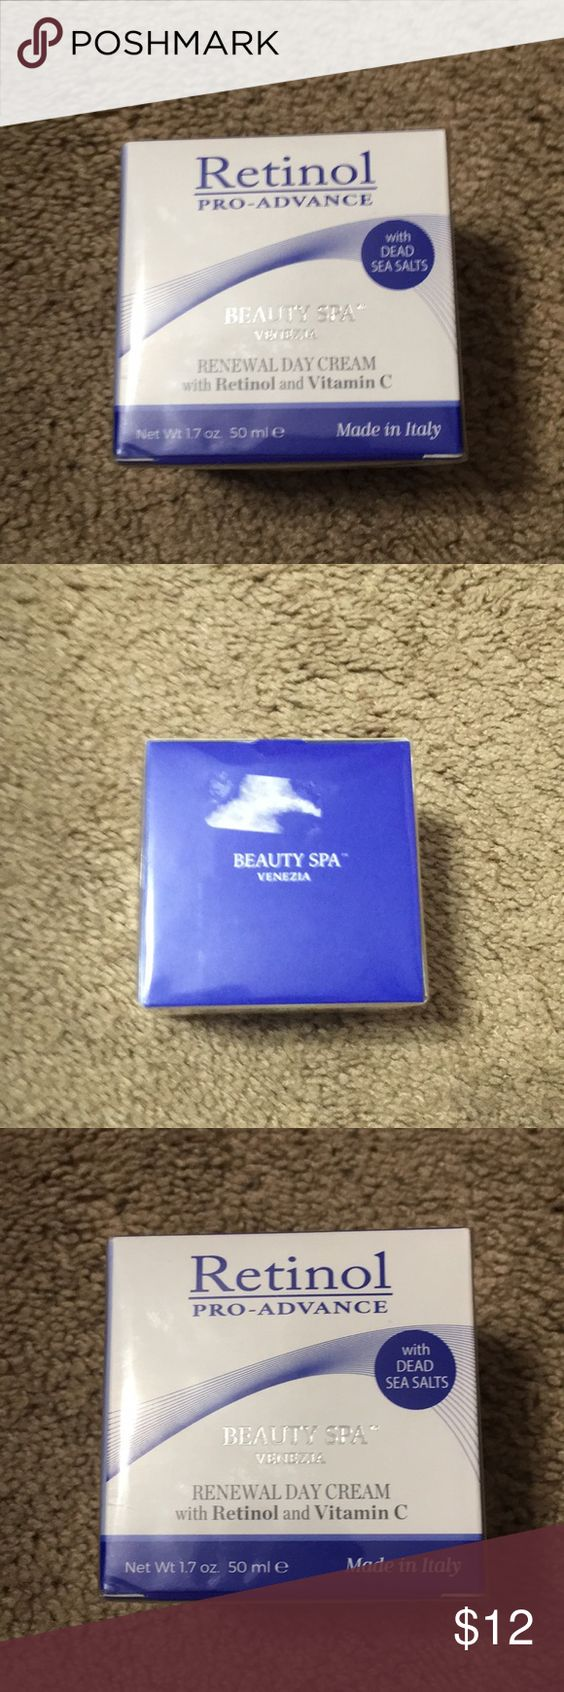 New Beauty Spa Venezia Retinol Renewal Day Cream New Beauty Spa Venezia Retinol Pro Advance Renewal Day Cream With Vitamin C Net Weight Retinol Beauty Spa Spa